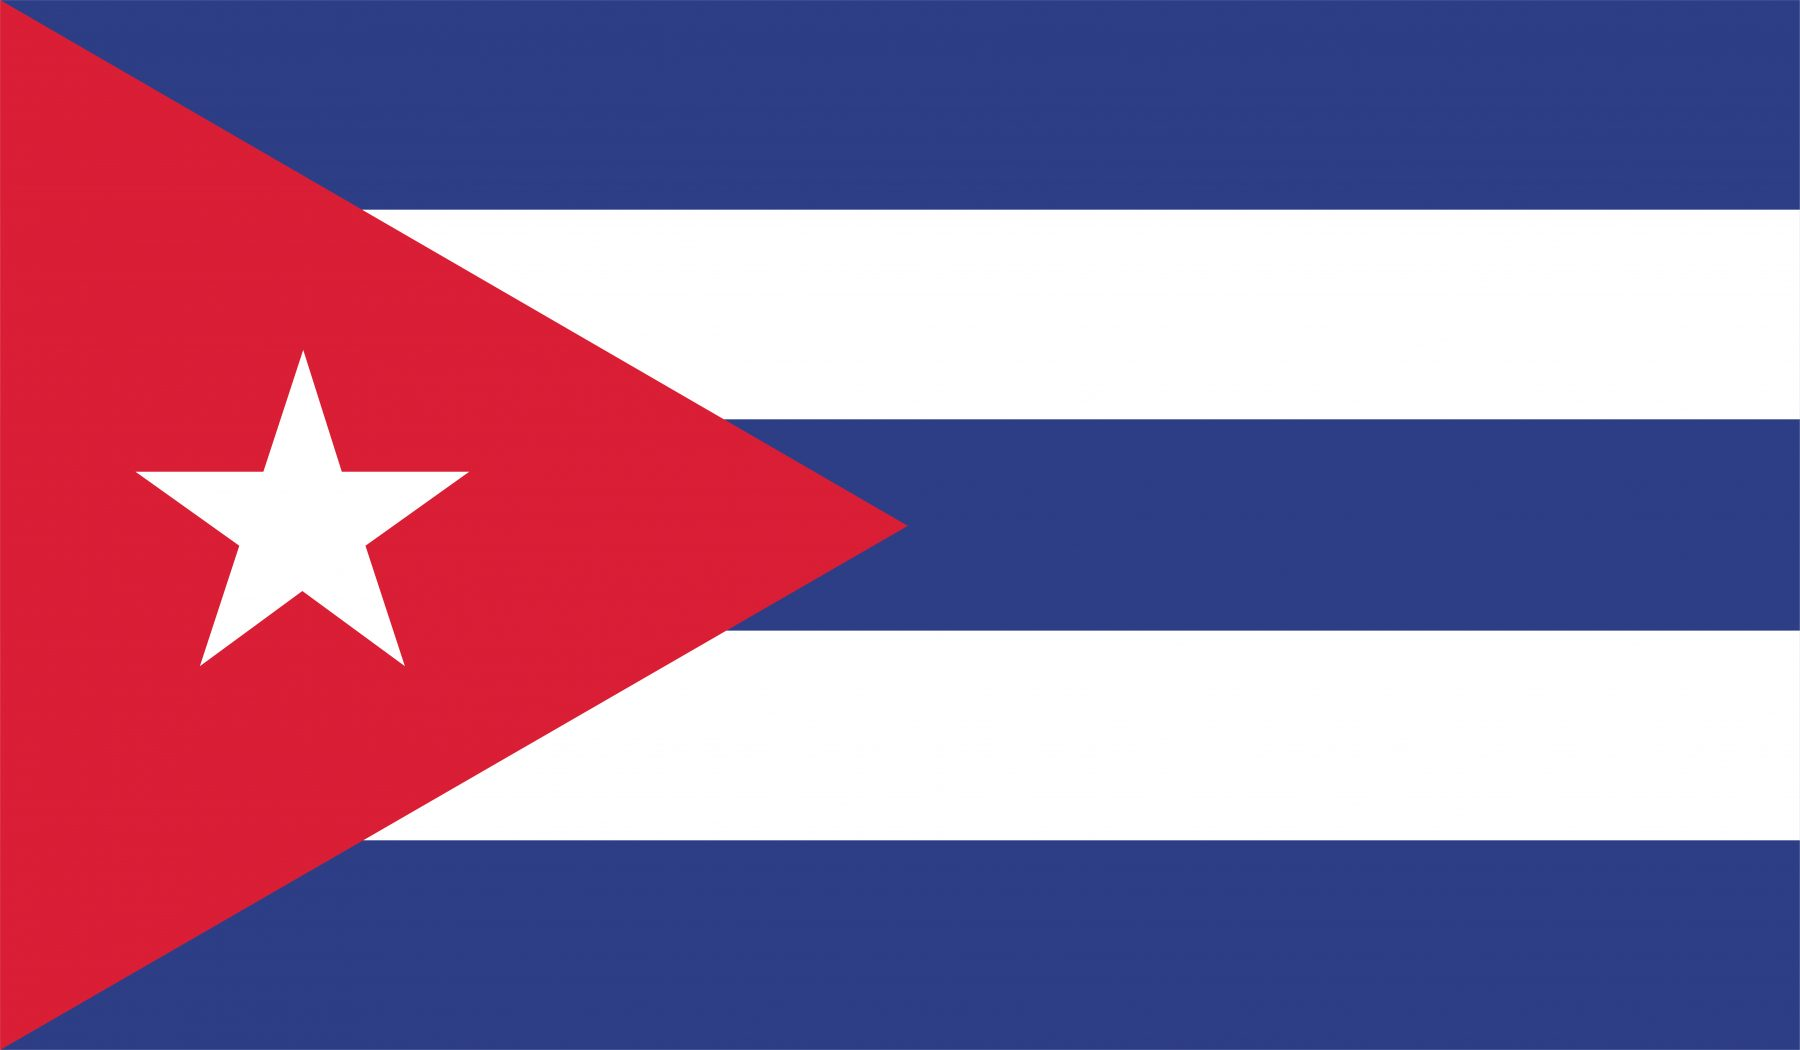 viaggio a Cuba bandiera